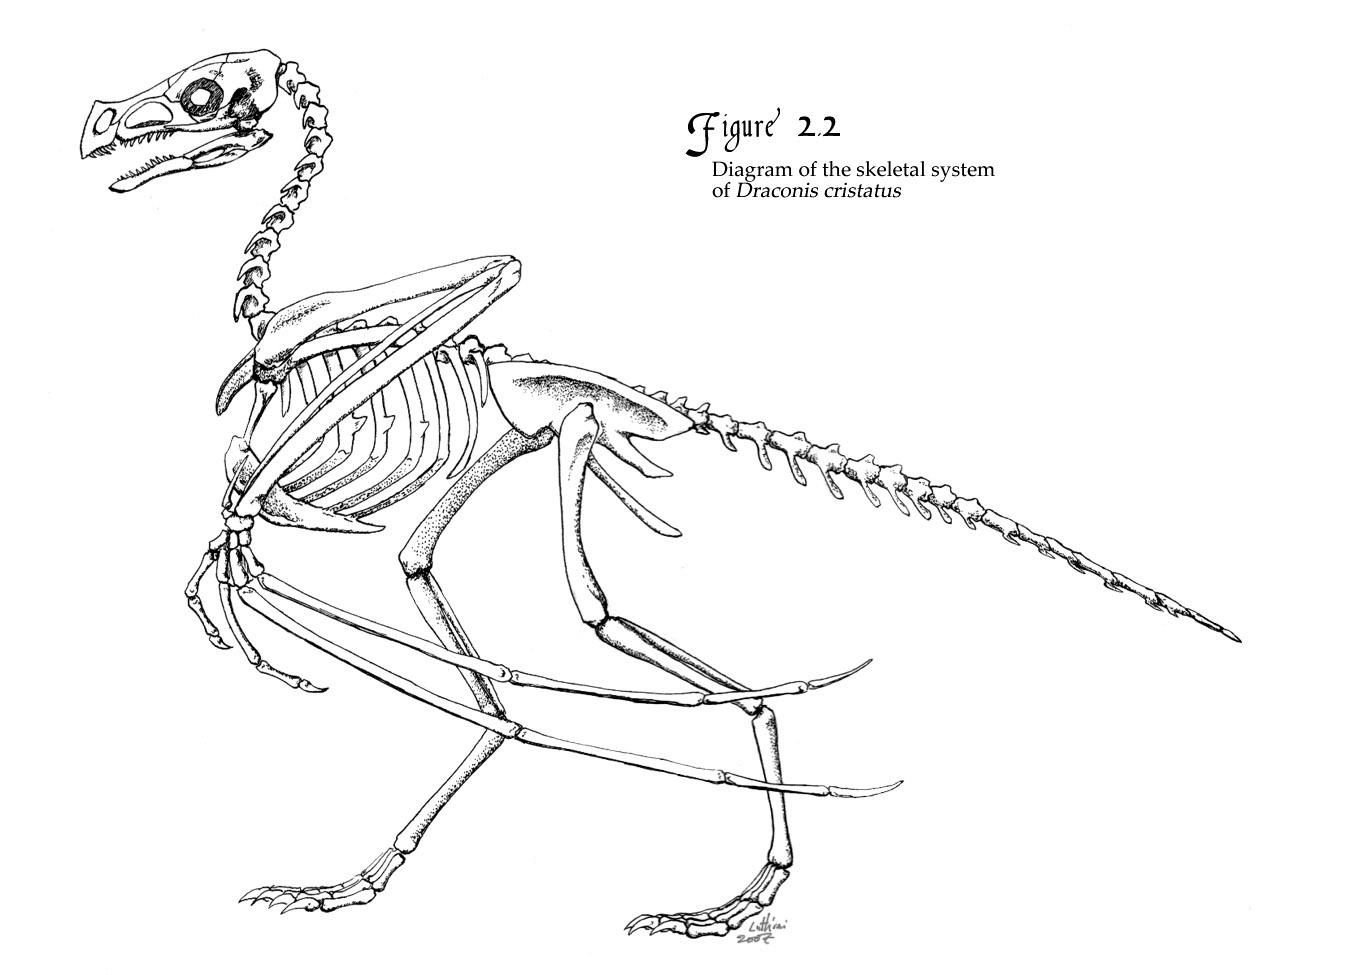 Bird Skeletal System Diagram - Trusted Wiring Diagram •